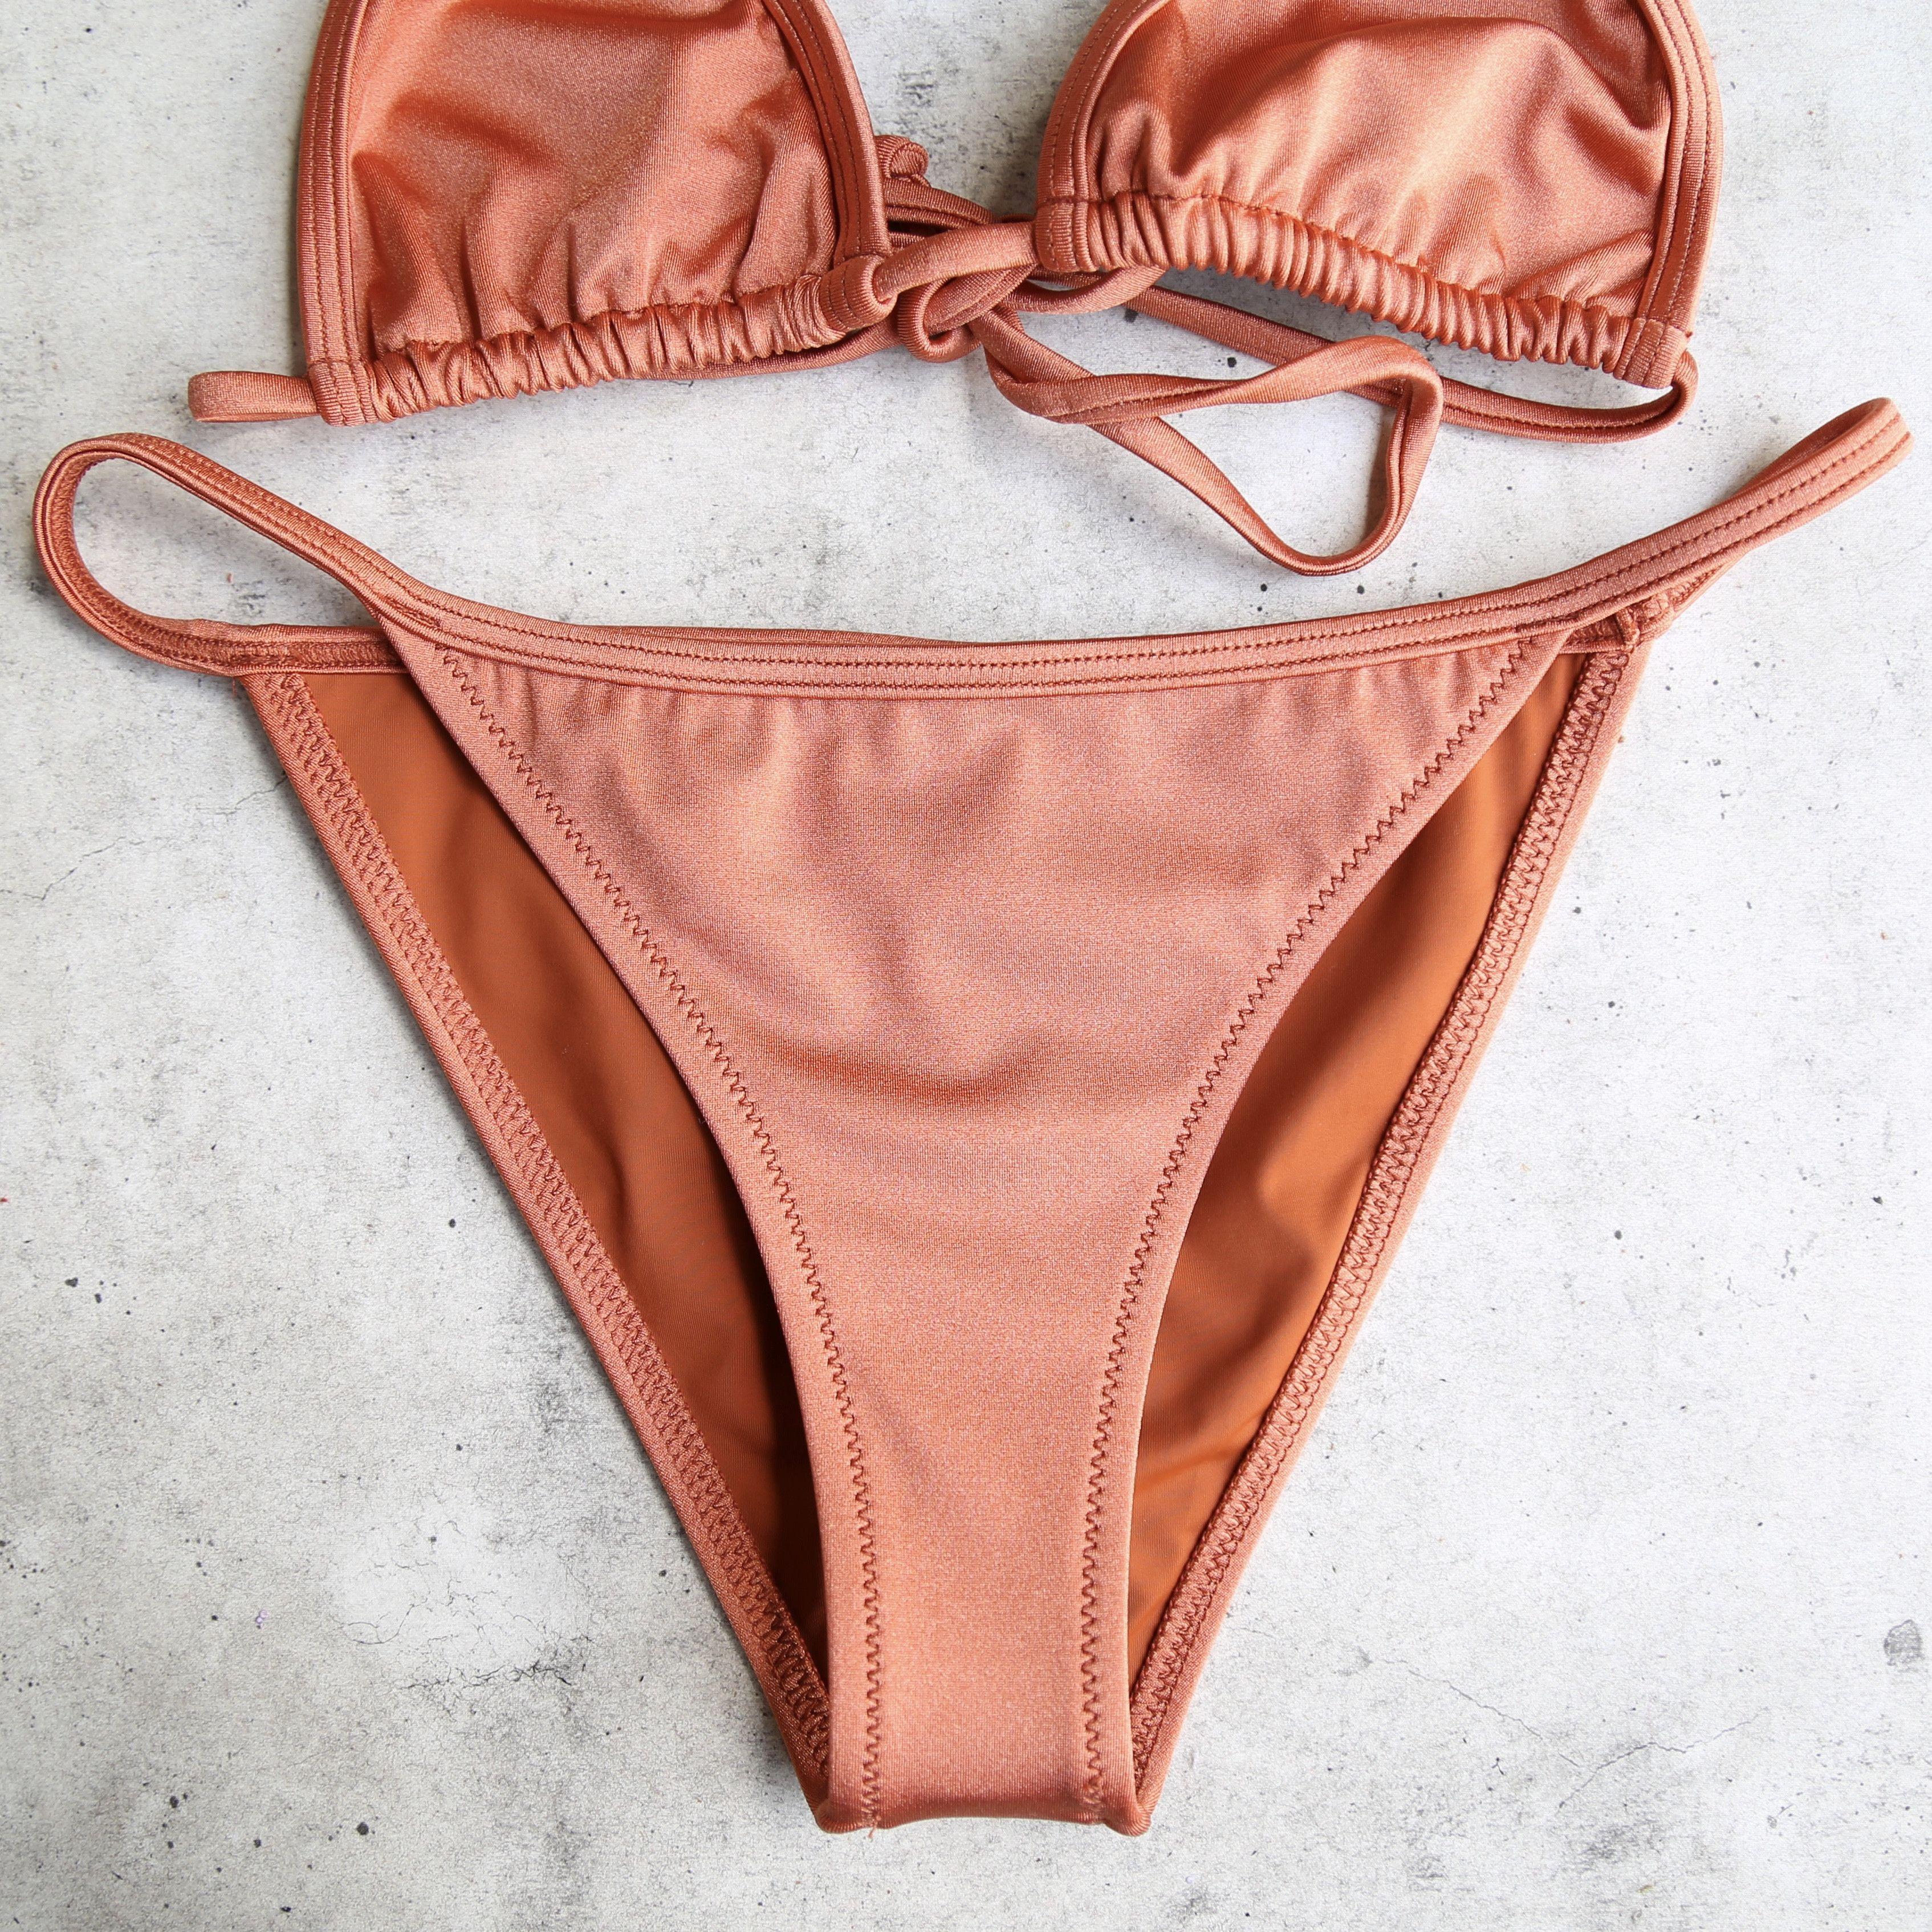 97a413f435 Final sale - itty bitty metallic string bikini separates - more ...